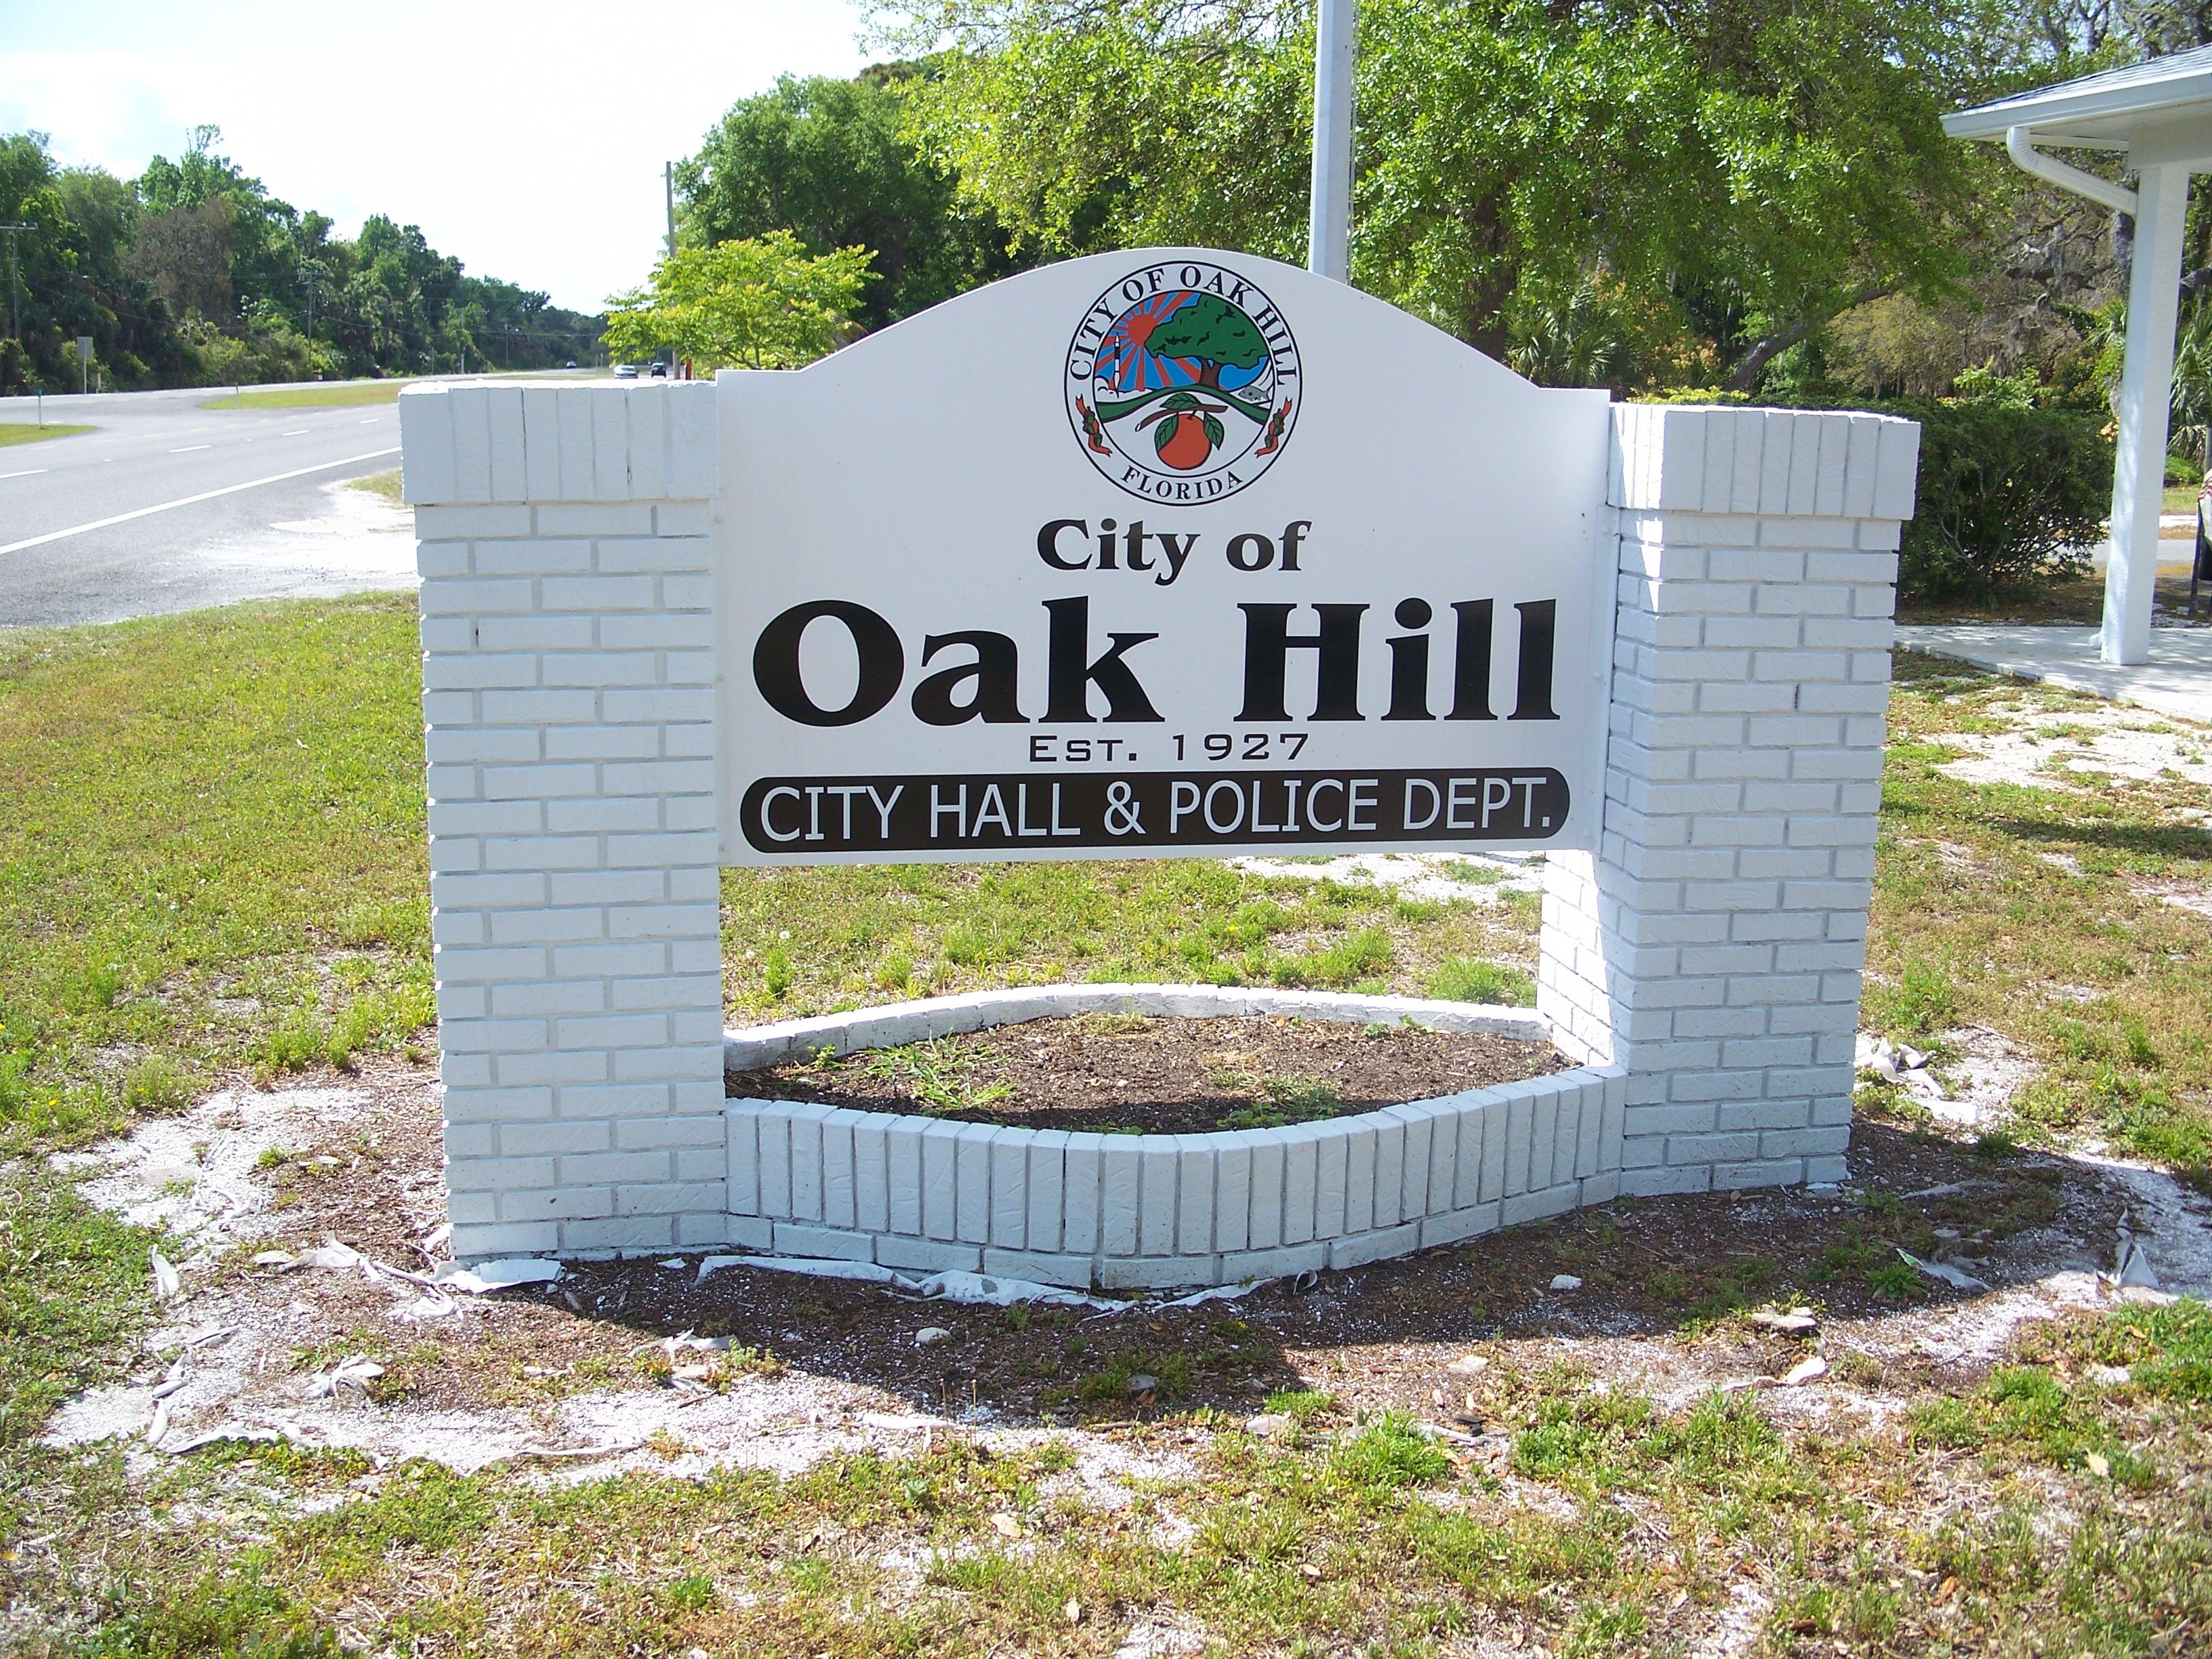 File:Oak Hill FL city halloak hill city